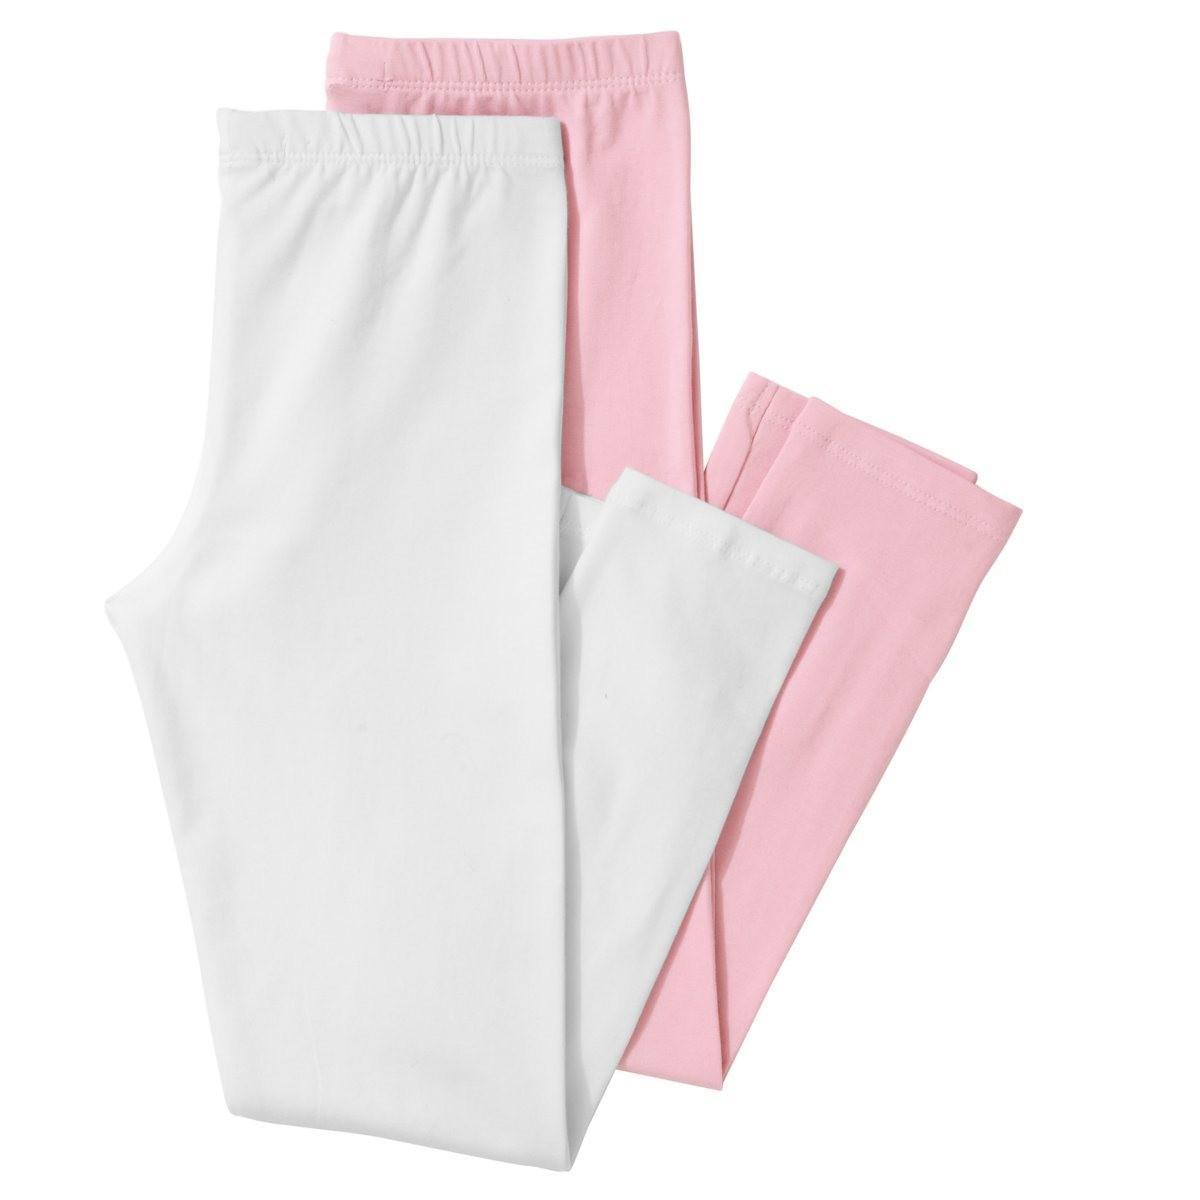 la redoute effen korte legging set van 2 in pink lyst. Black Bedroom Furniture Sets. Home Design Ideas